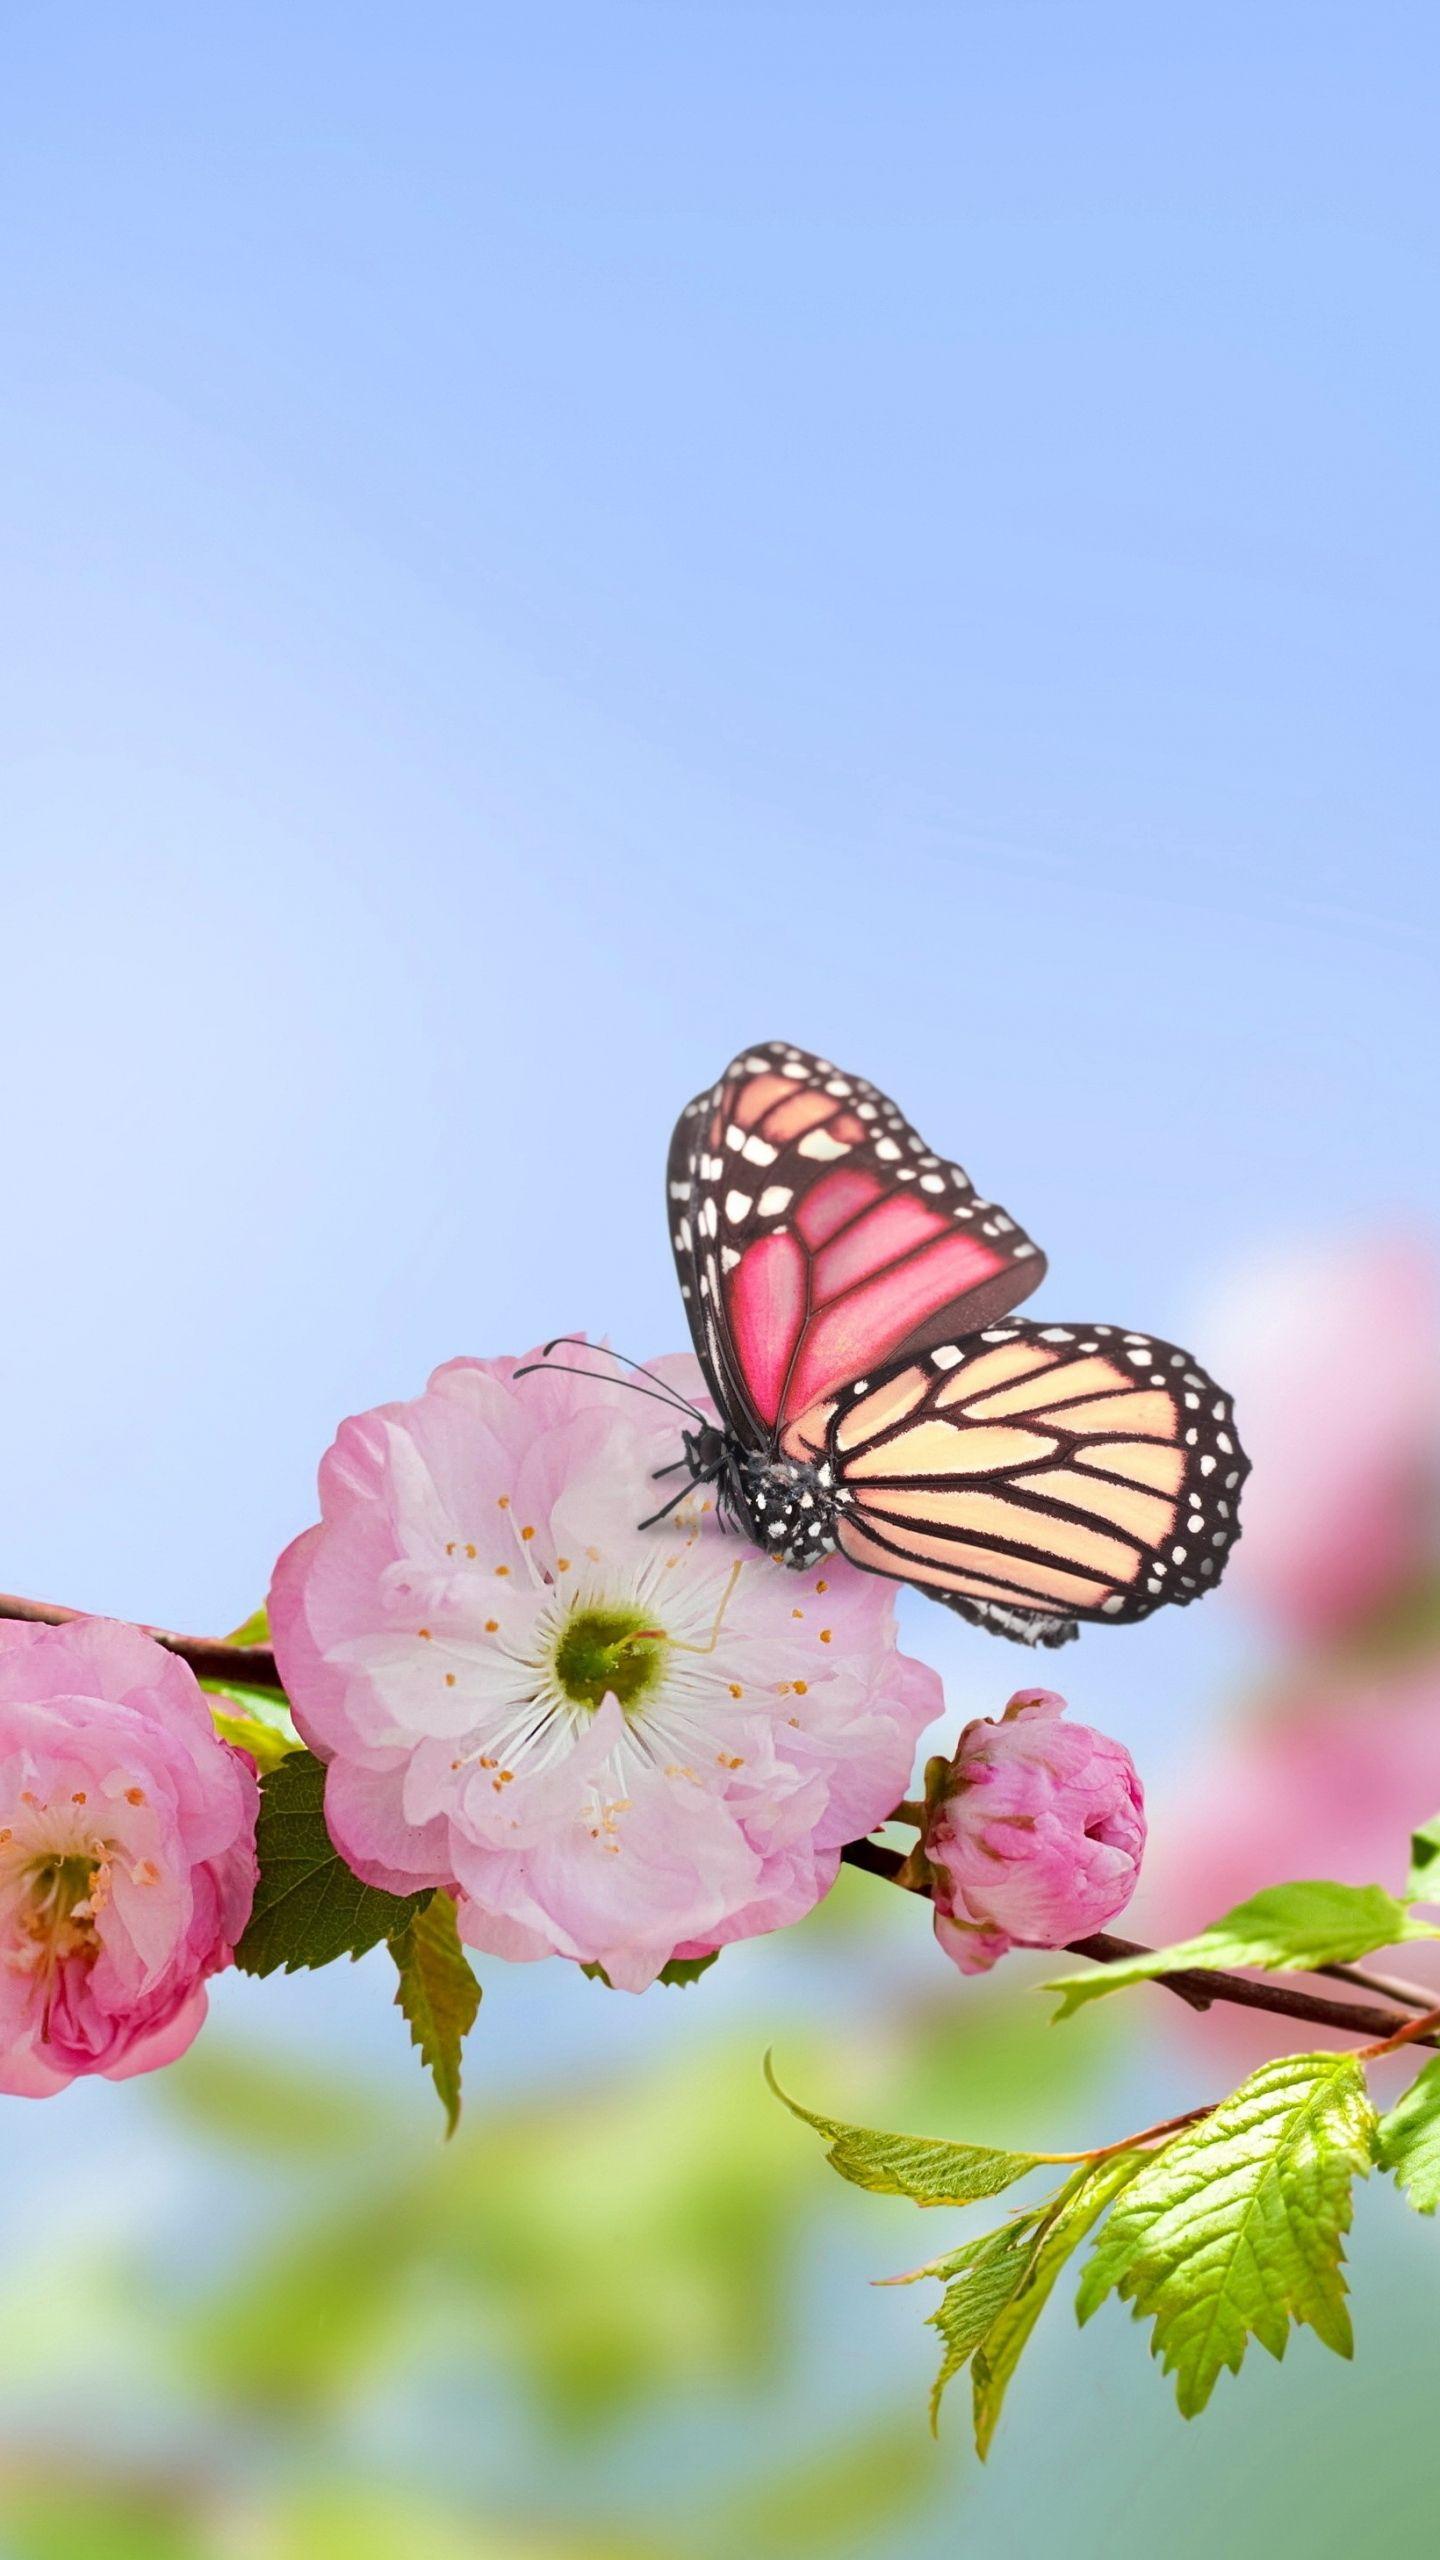 Spring Butterfly Wallpaper Full Hd Outdoors Wallpaper 1080p Butterfly Wallpaper Spring Flowers Wallpaper Flower Wallpaper